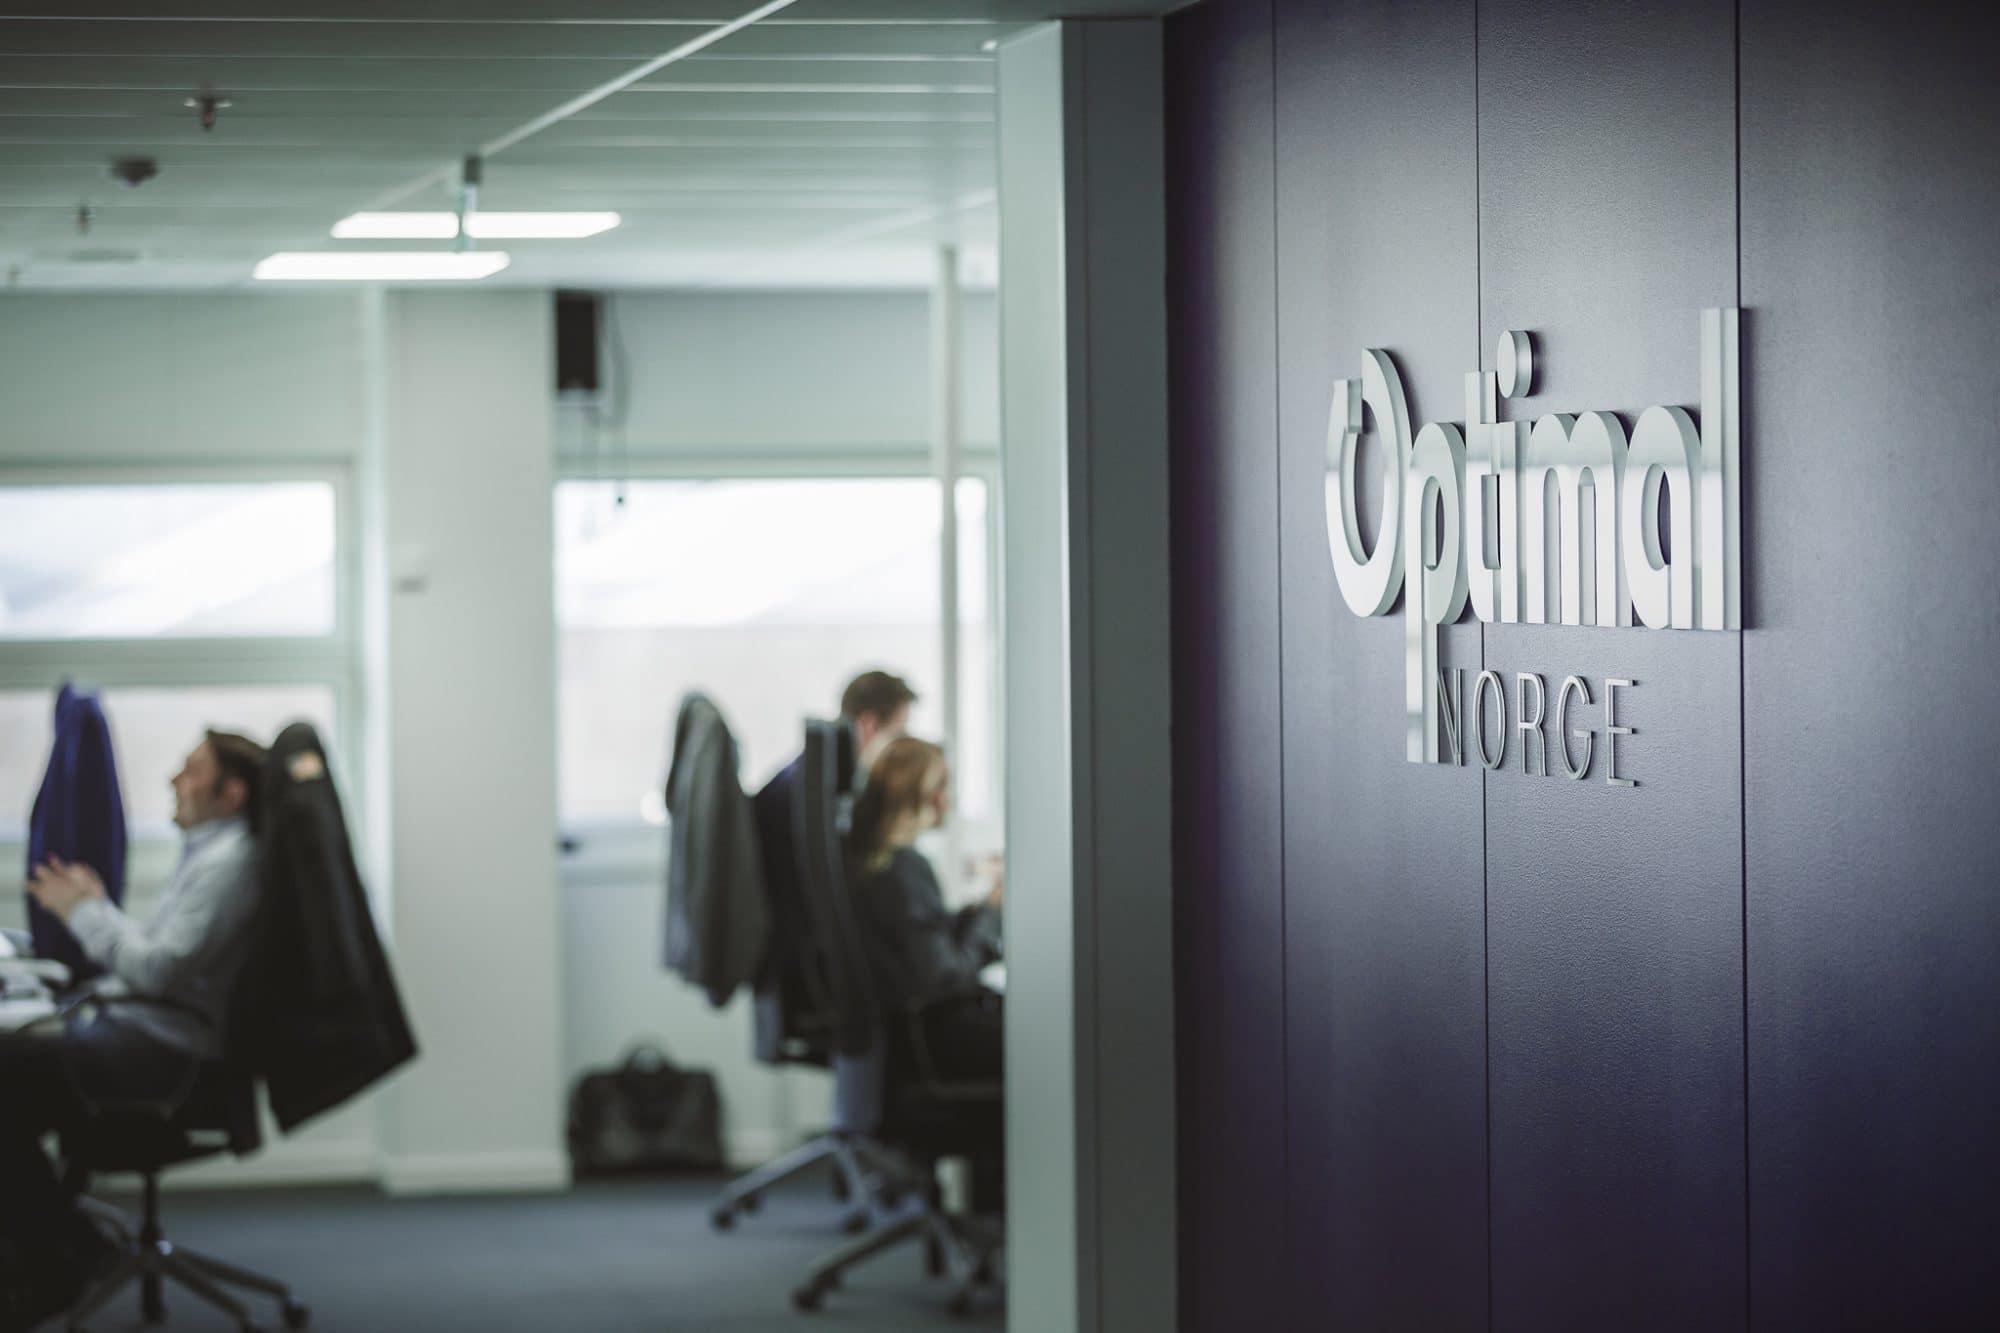 optimal norge mediebyrå digital markedsføring